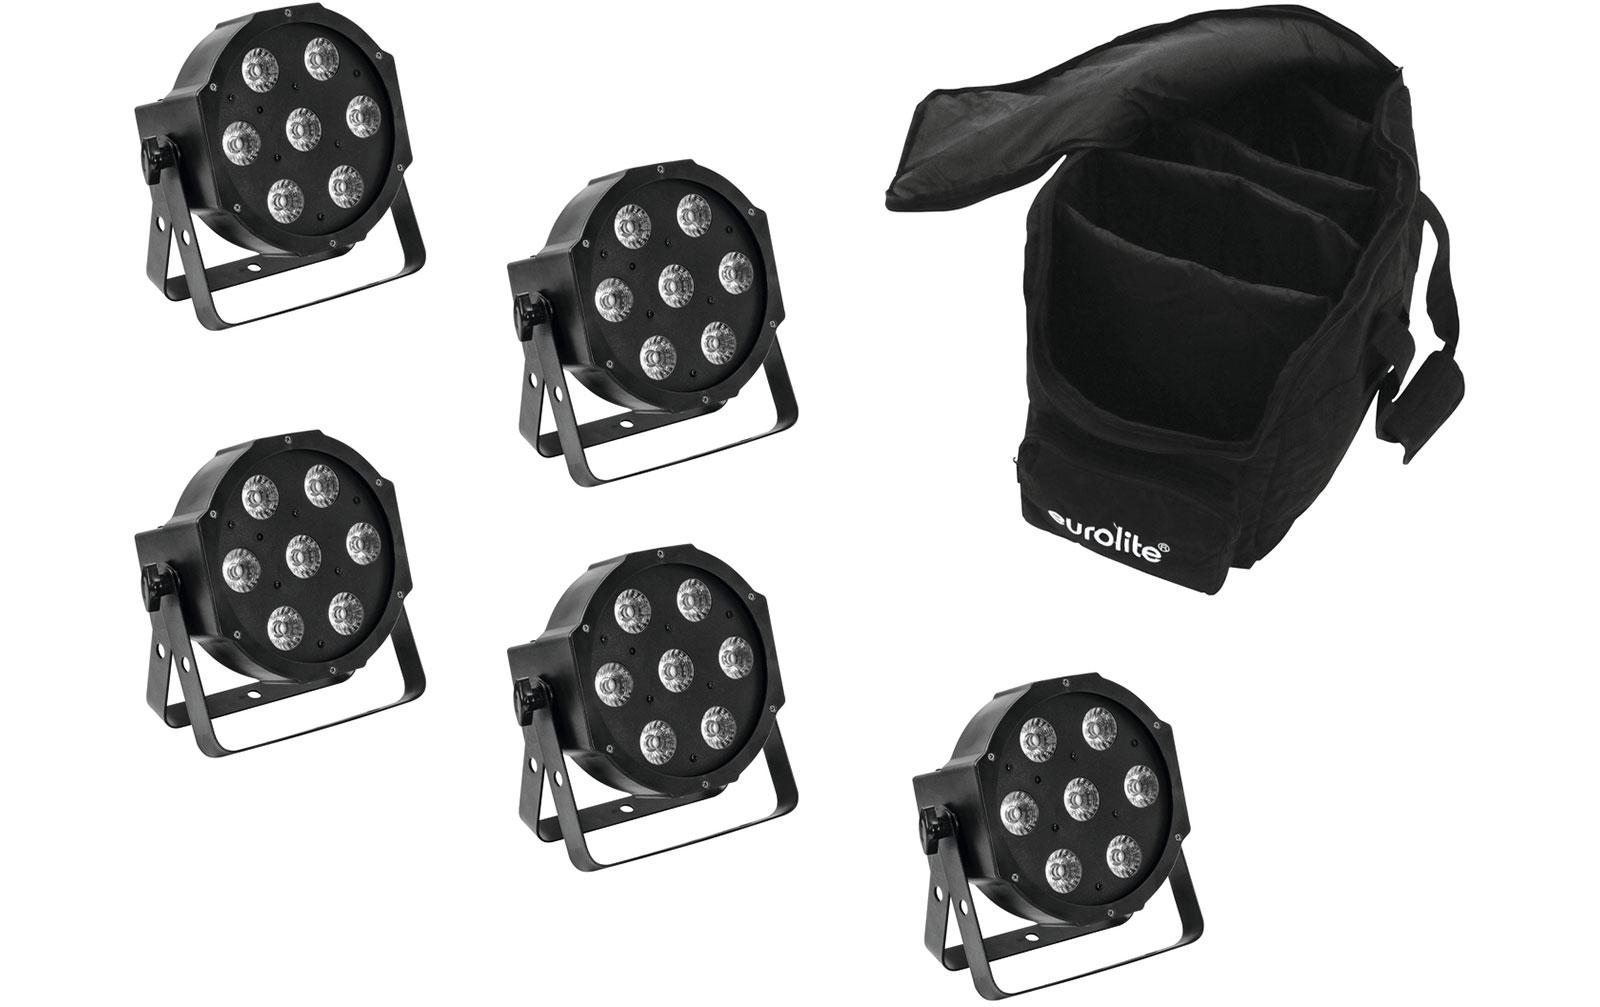 eurolite-set-5x-led-sls-7-hcl-spot-soft-bag